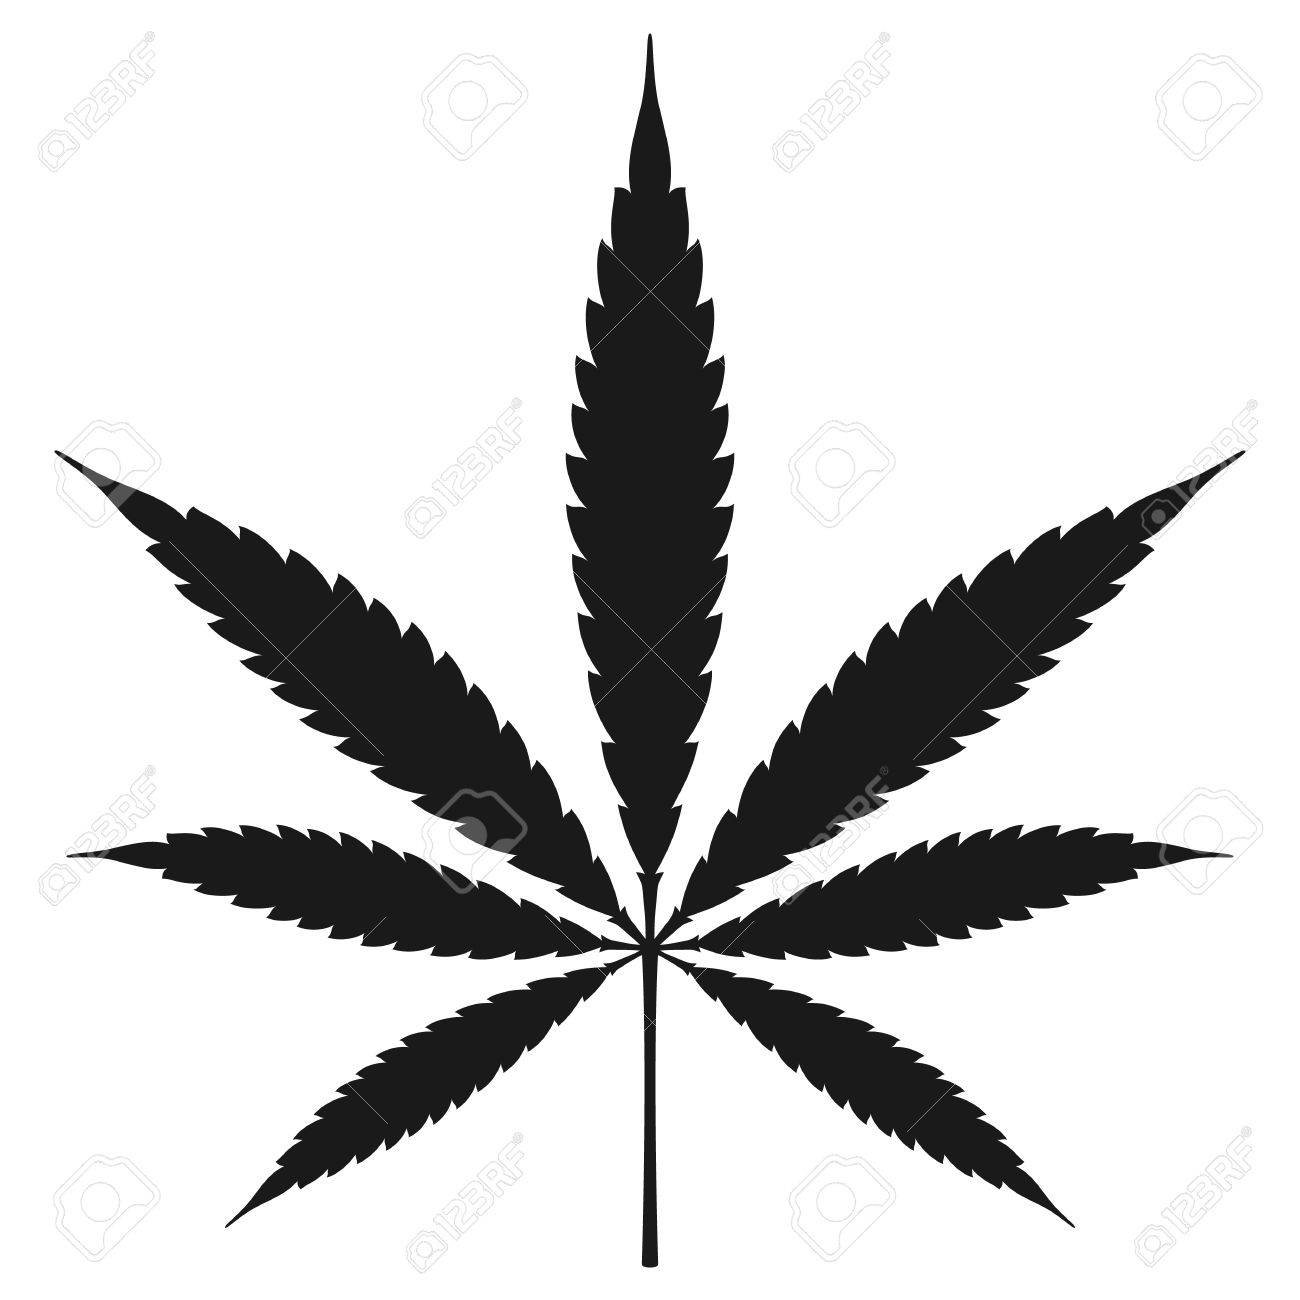 marijuana leaf vector illustration royalty free cliparts vectors rh 123rf com marijuana leaf vector art marijuana leaf vector icon